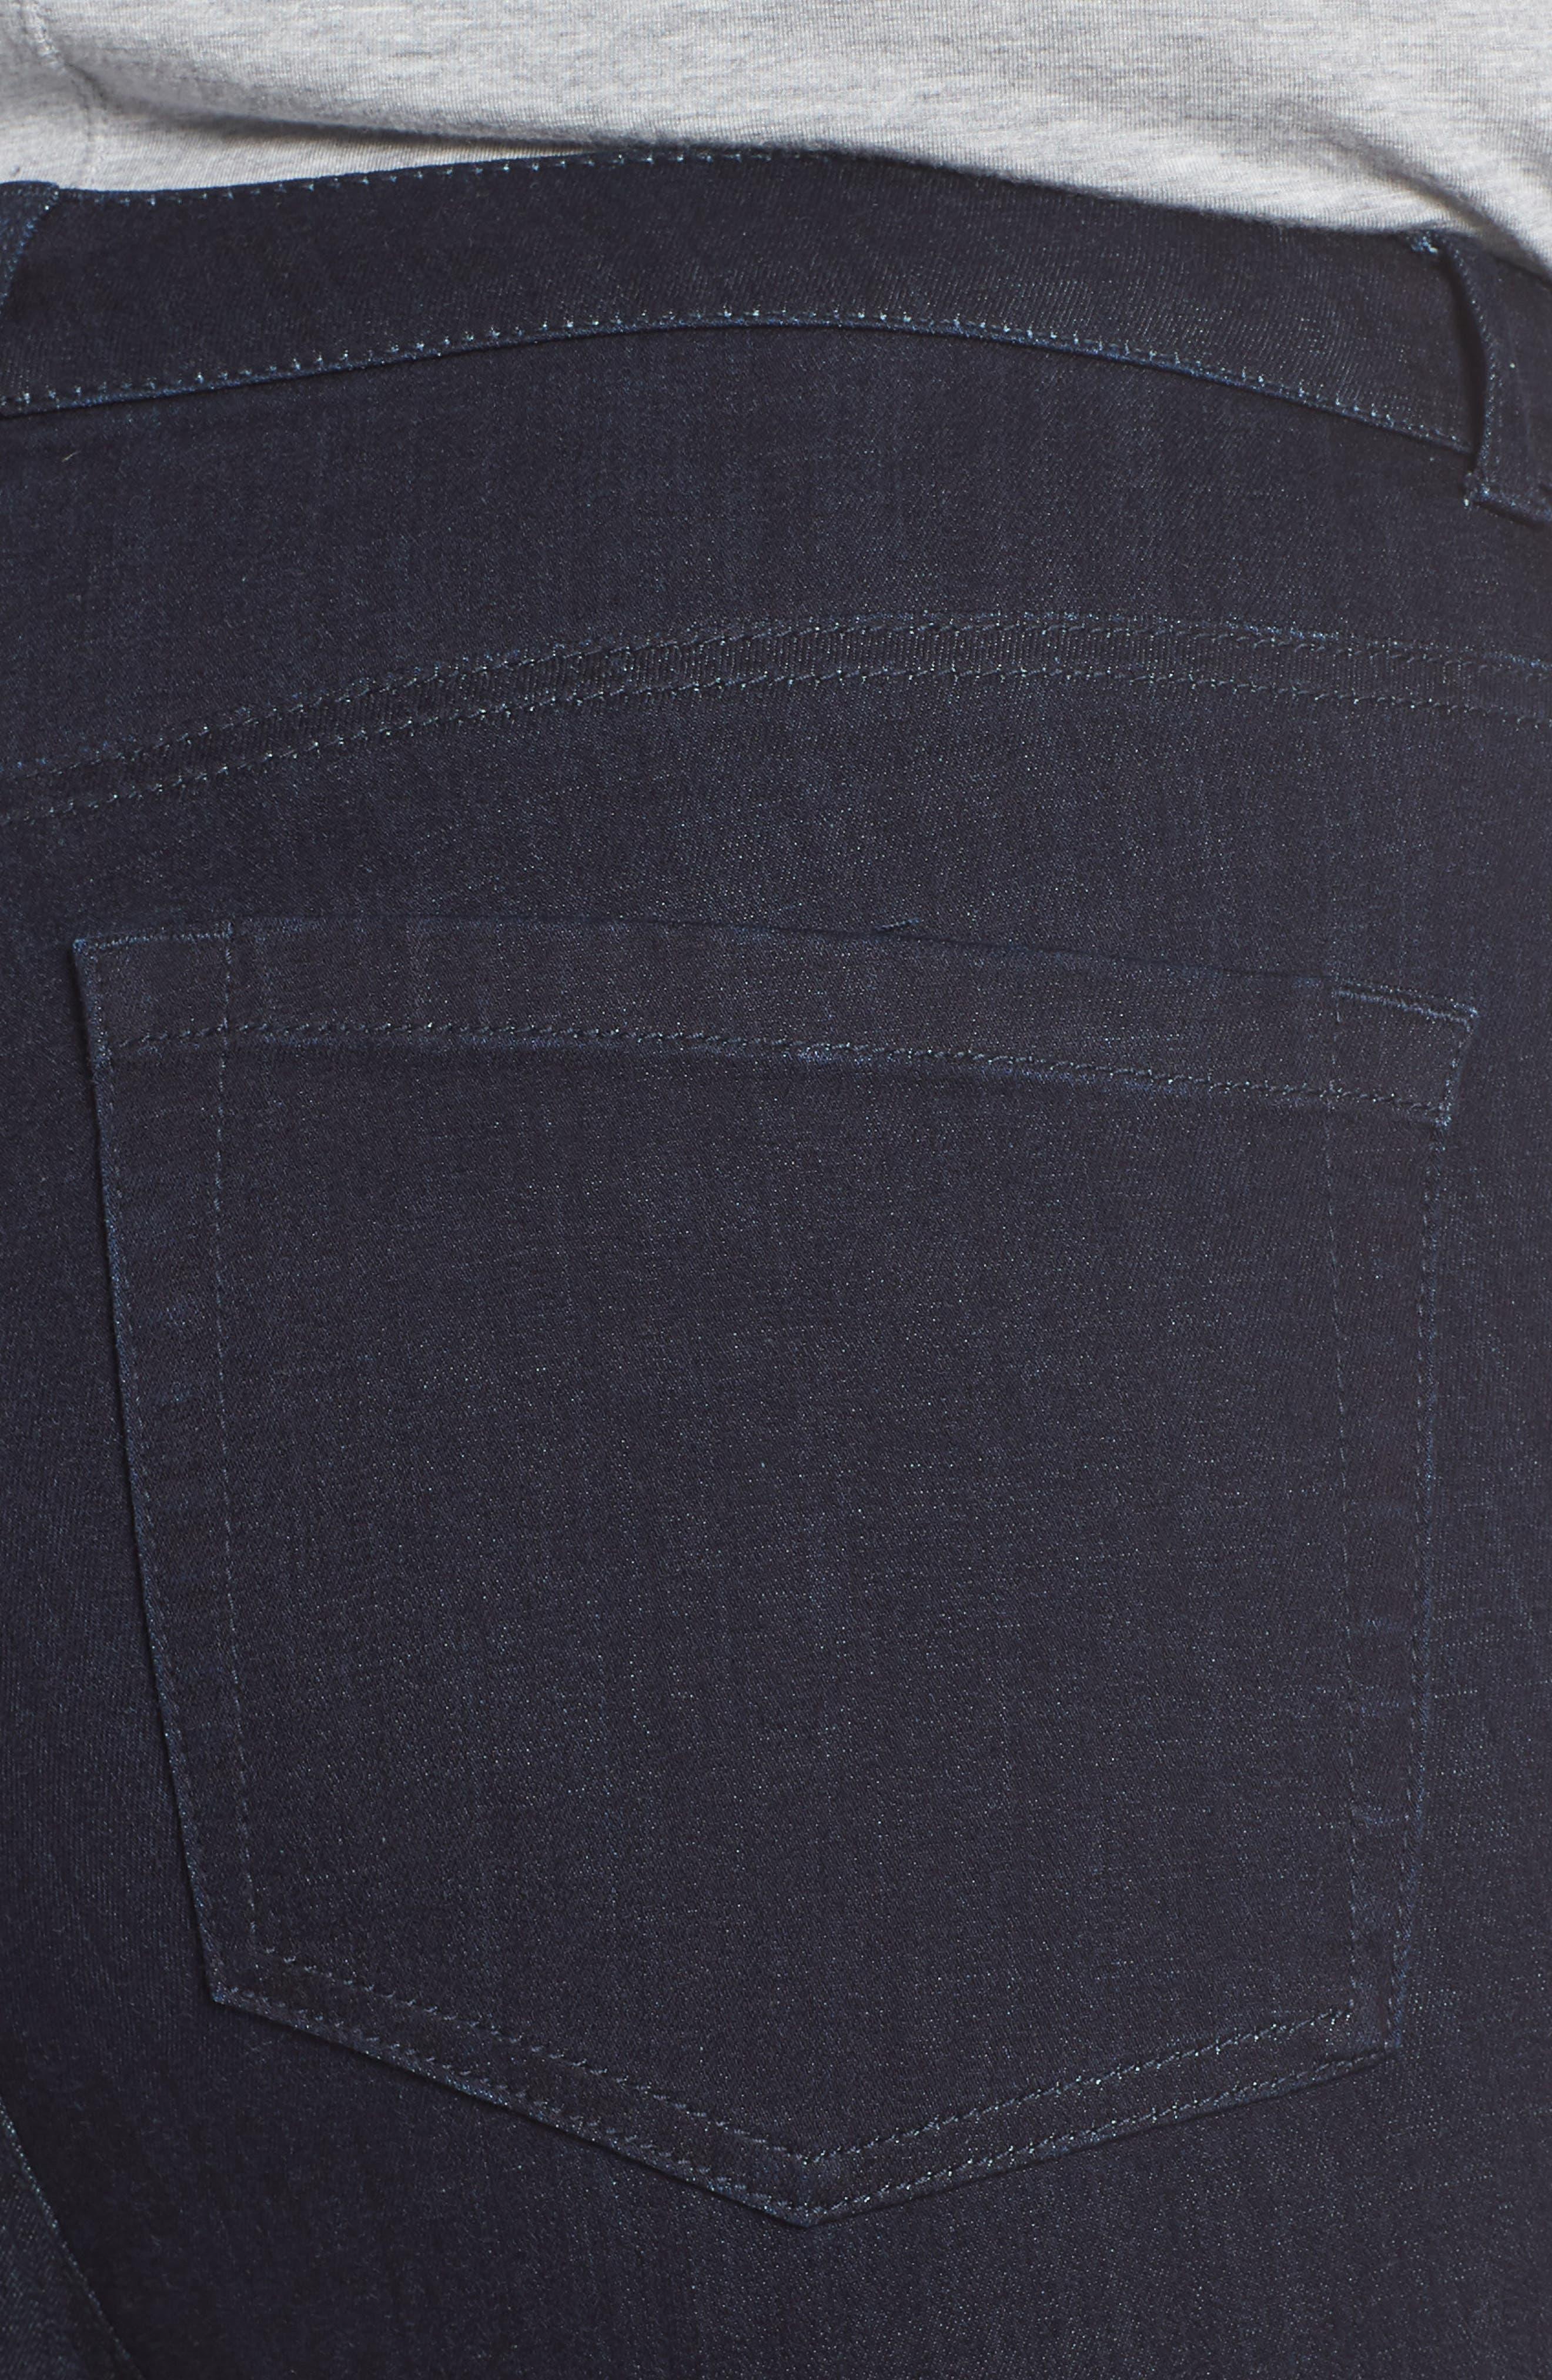 Stretch Skinny Jeans,                             Alternate thumbnail 4, color,                             DARK RINSE